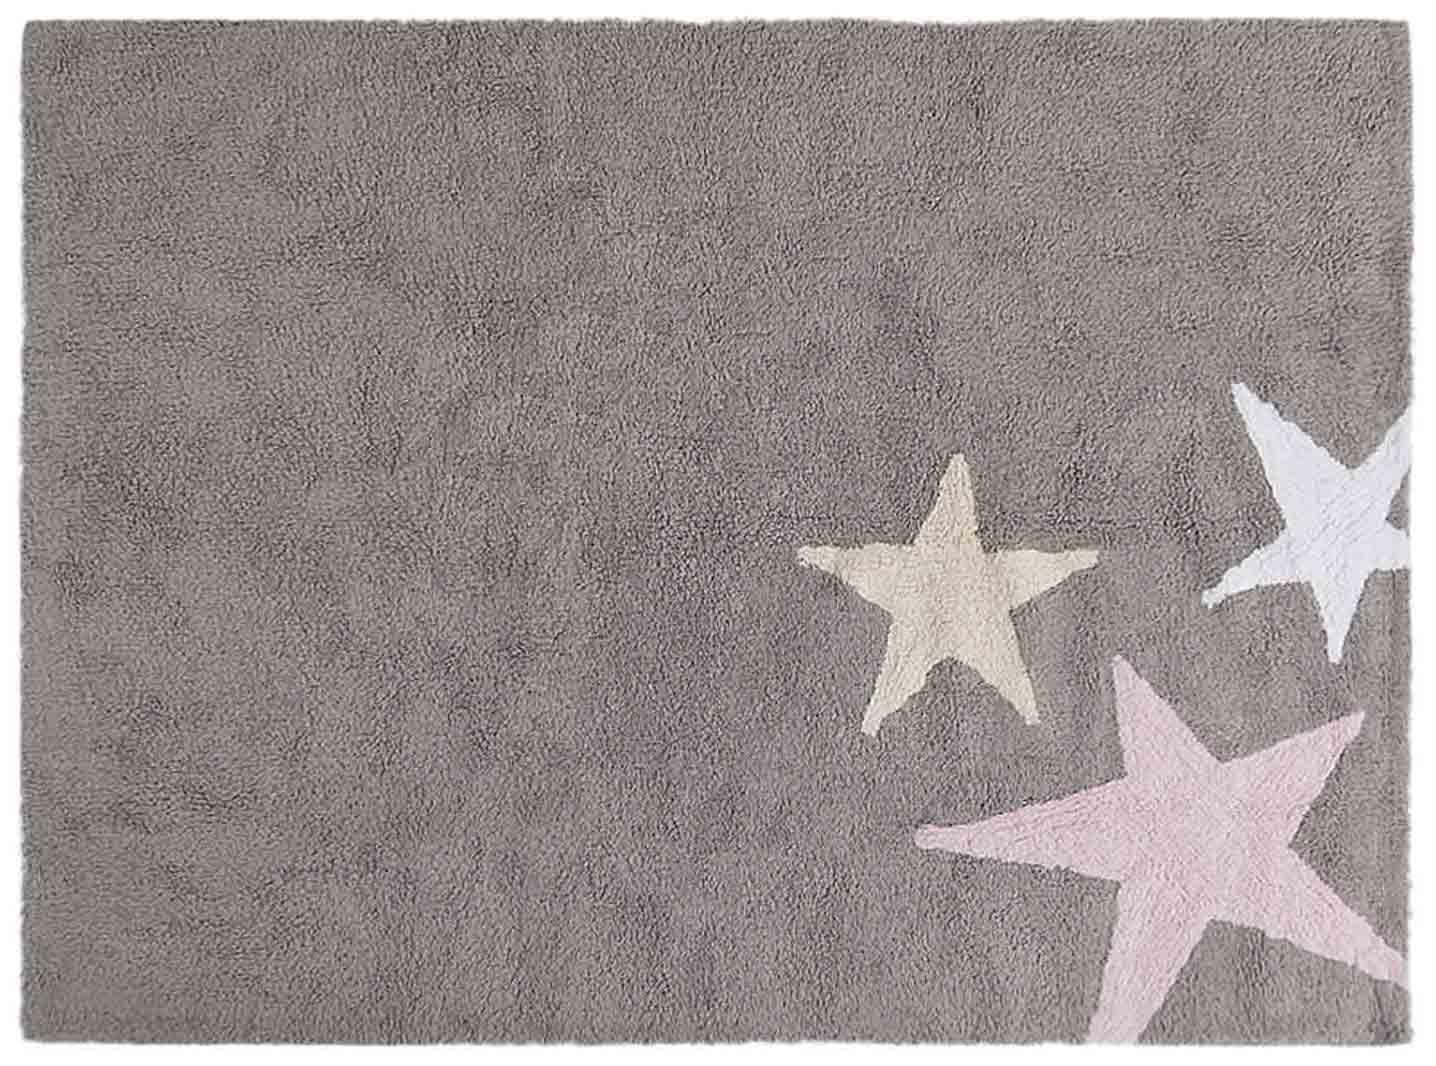 Ковер Lorena Canals Три звезды Three Stars серые и розовые 120*160